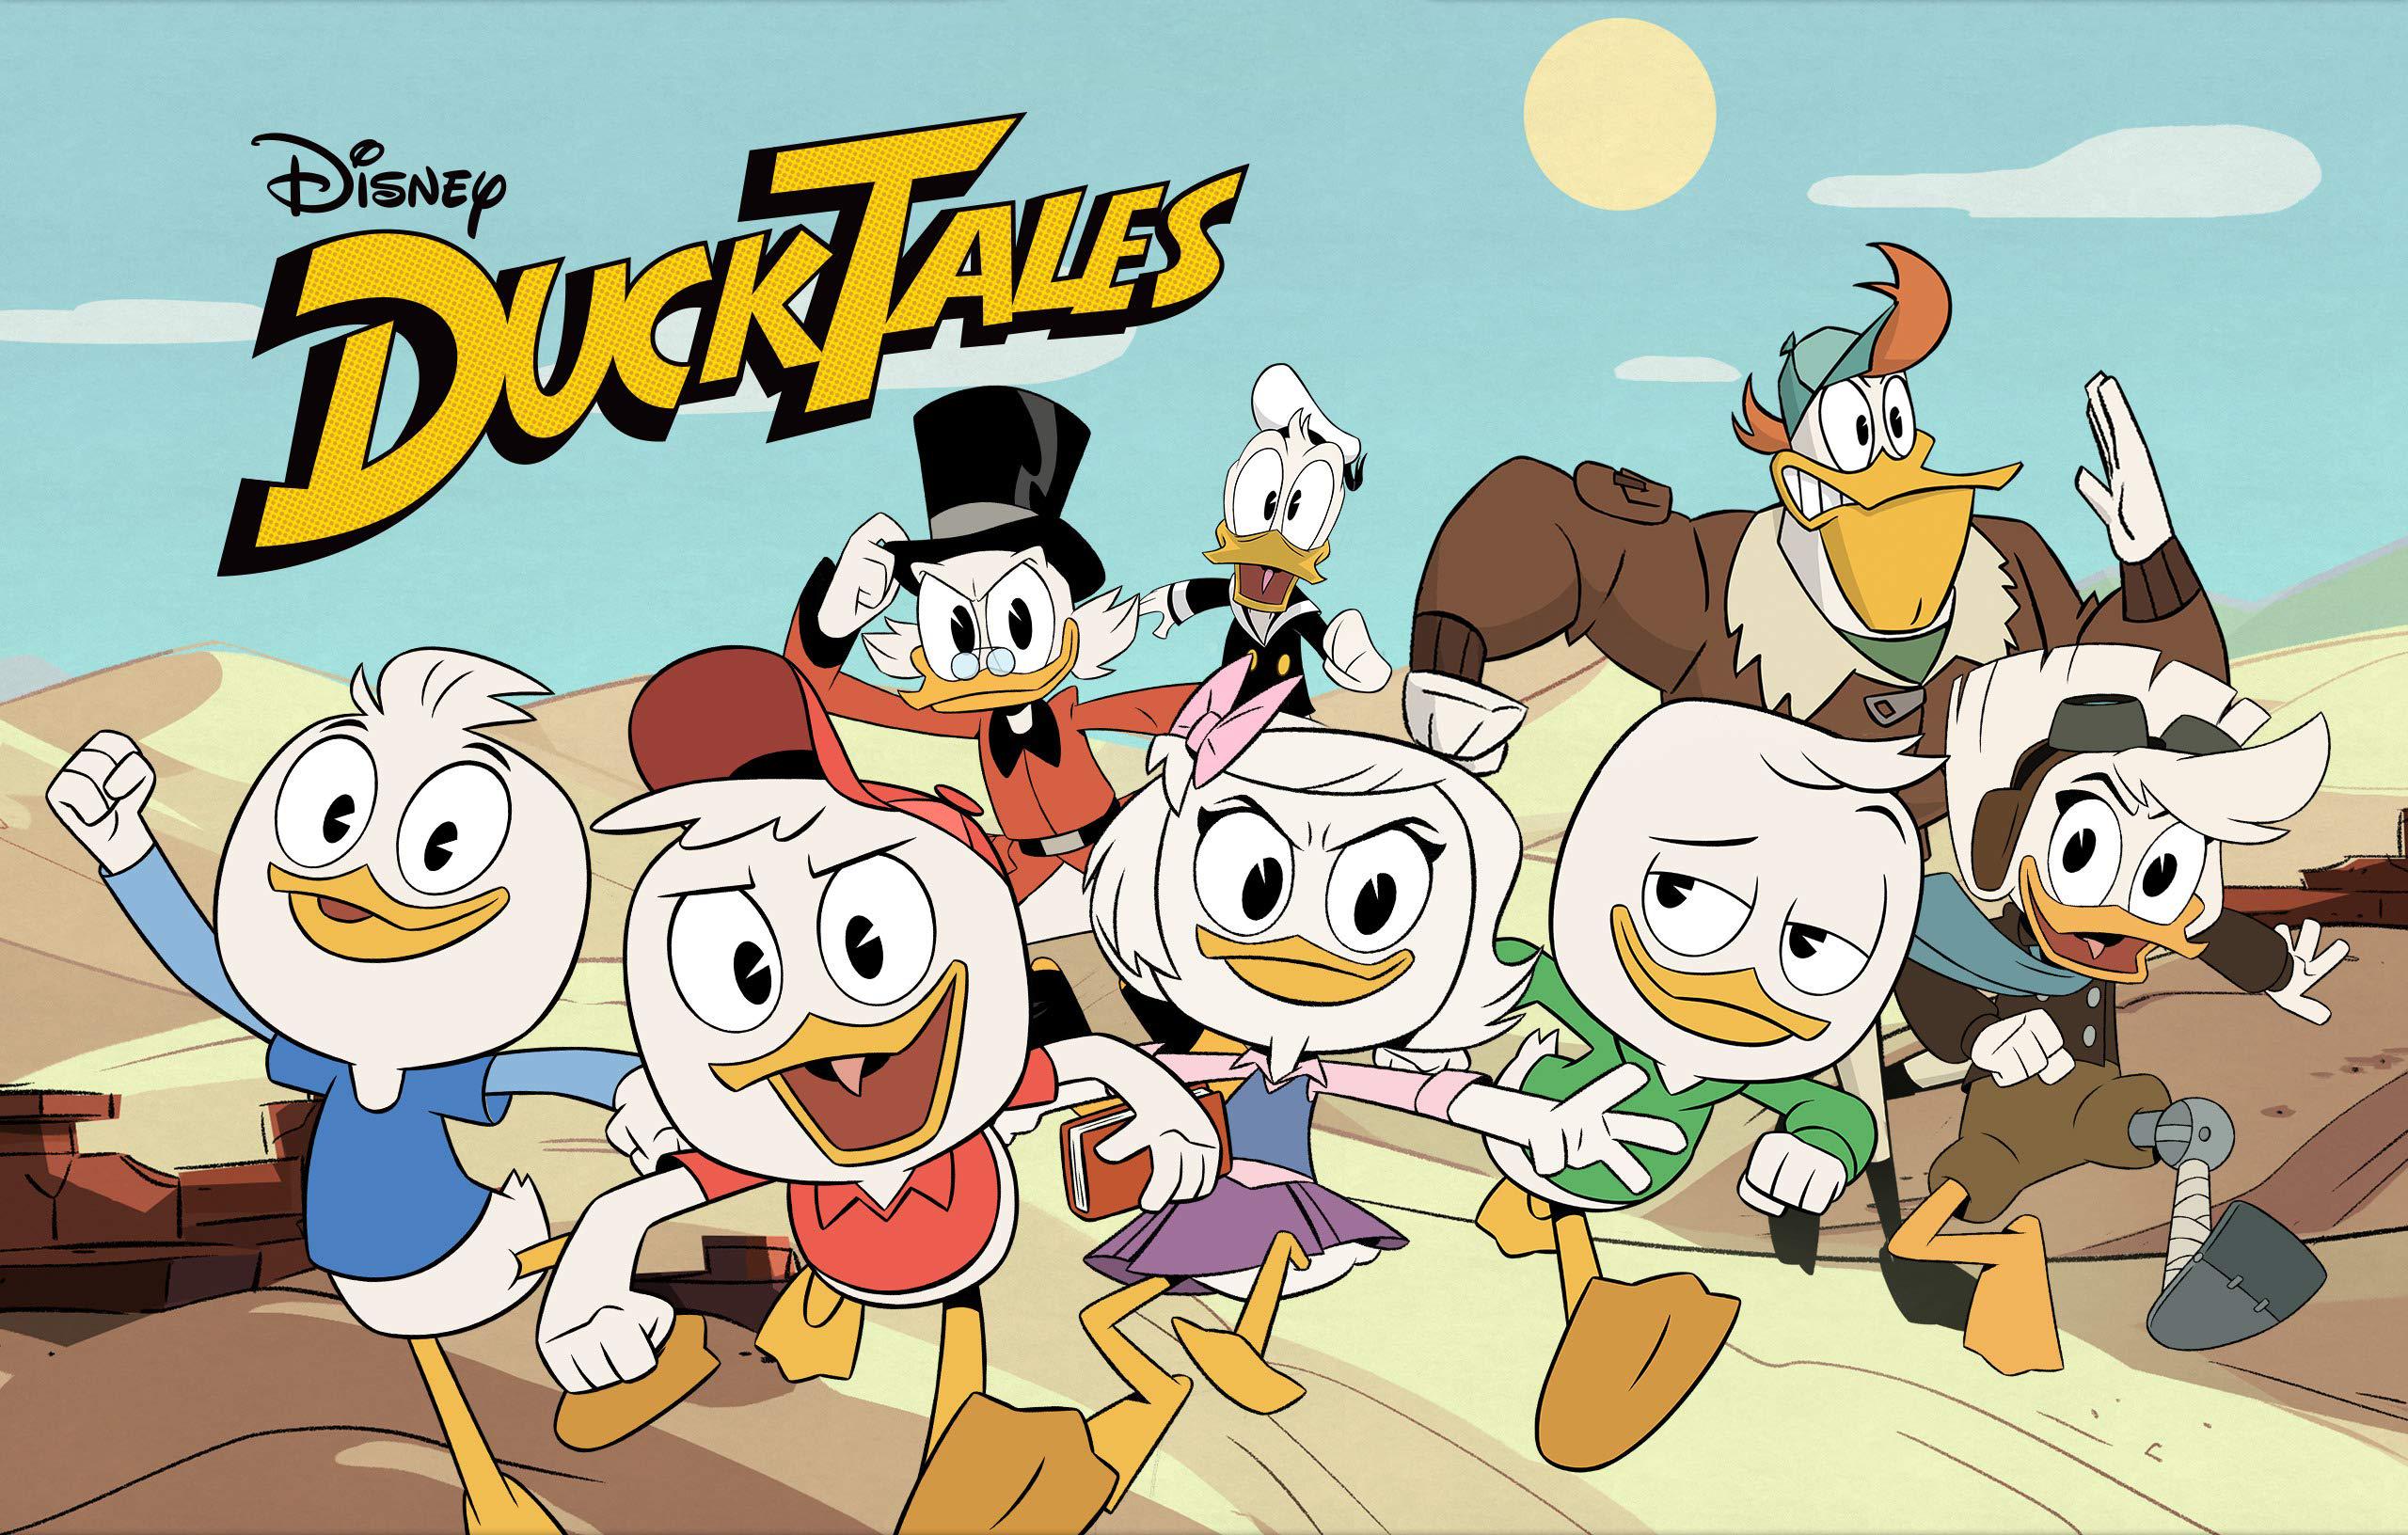 DuckTales (2017) Season 3 Episode 21: Release Date and Preview - OtakuKart